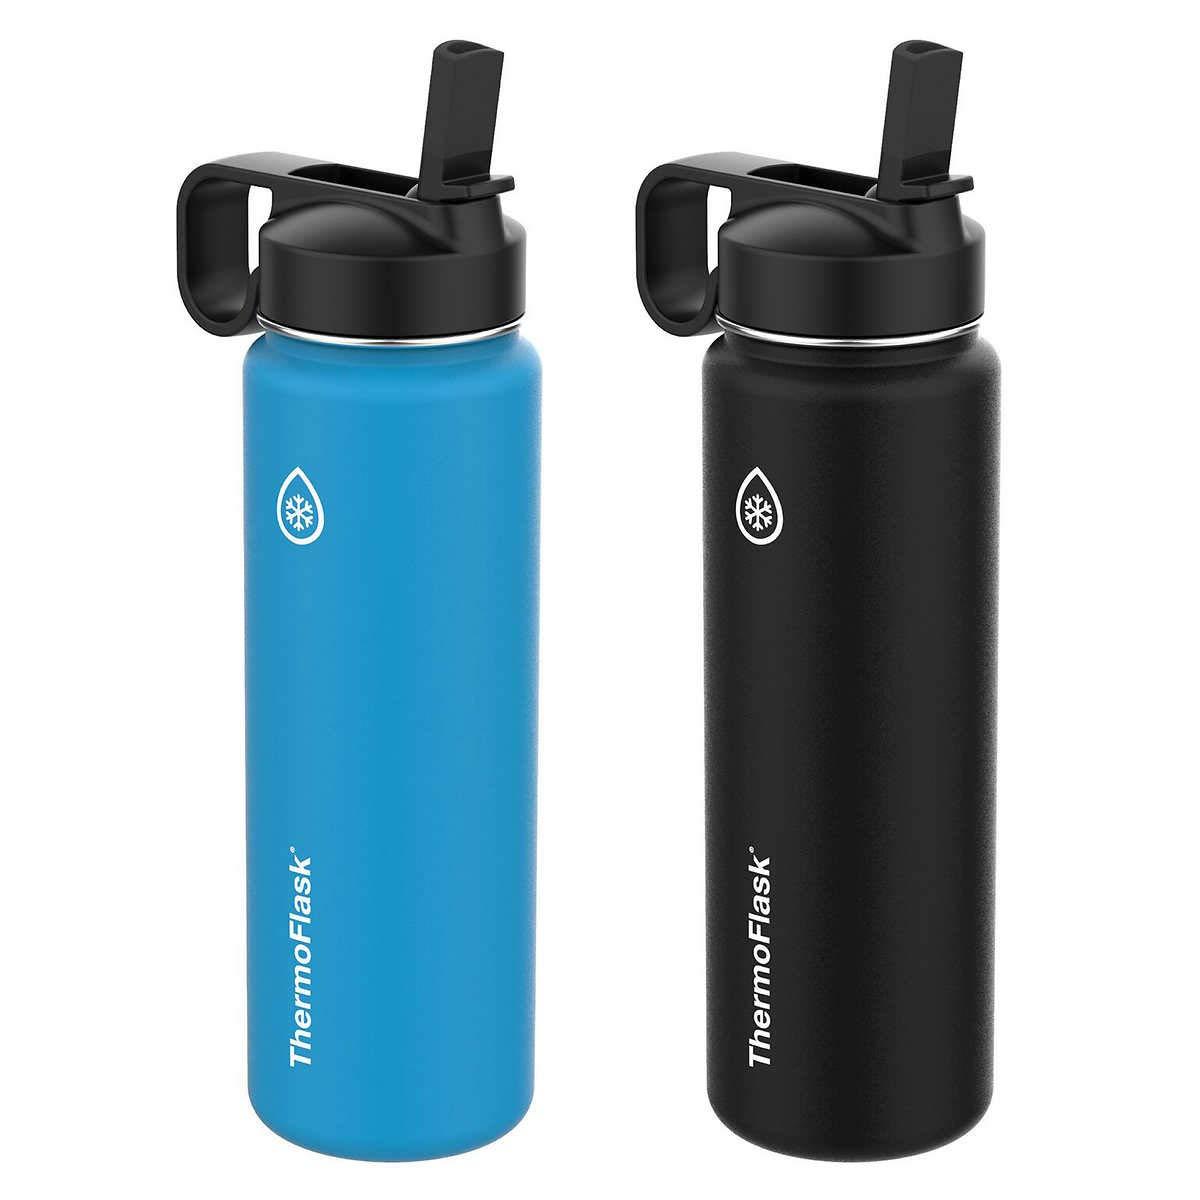 Thermoflaskステンレススチール24oz水ボトル、2 - Pack B07FSXXGNC